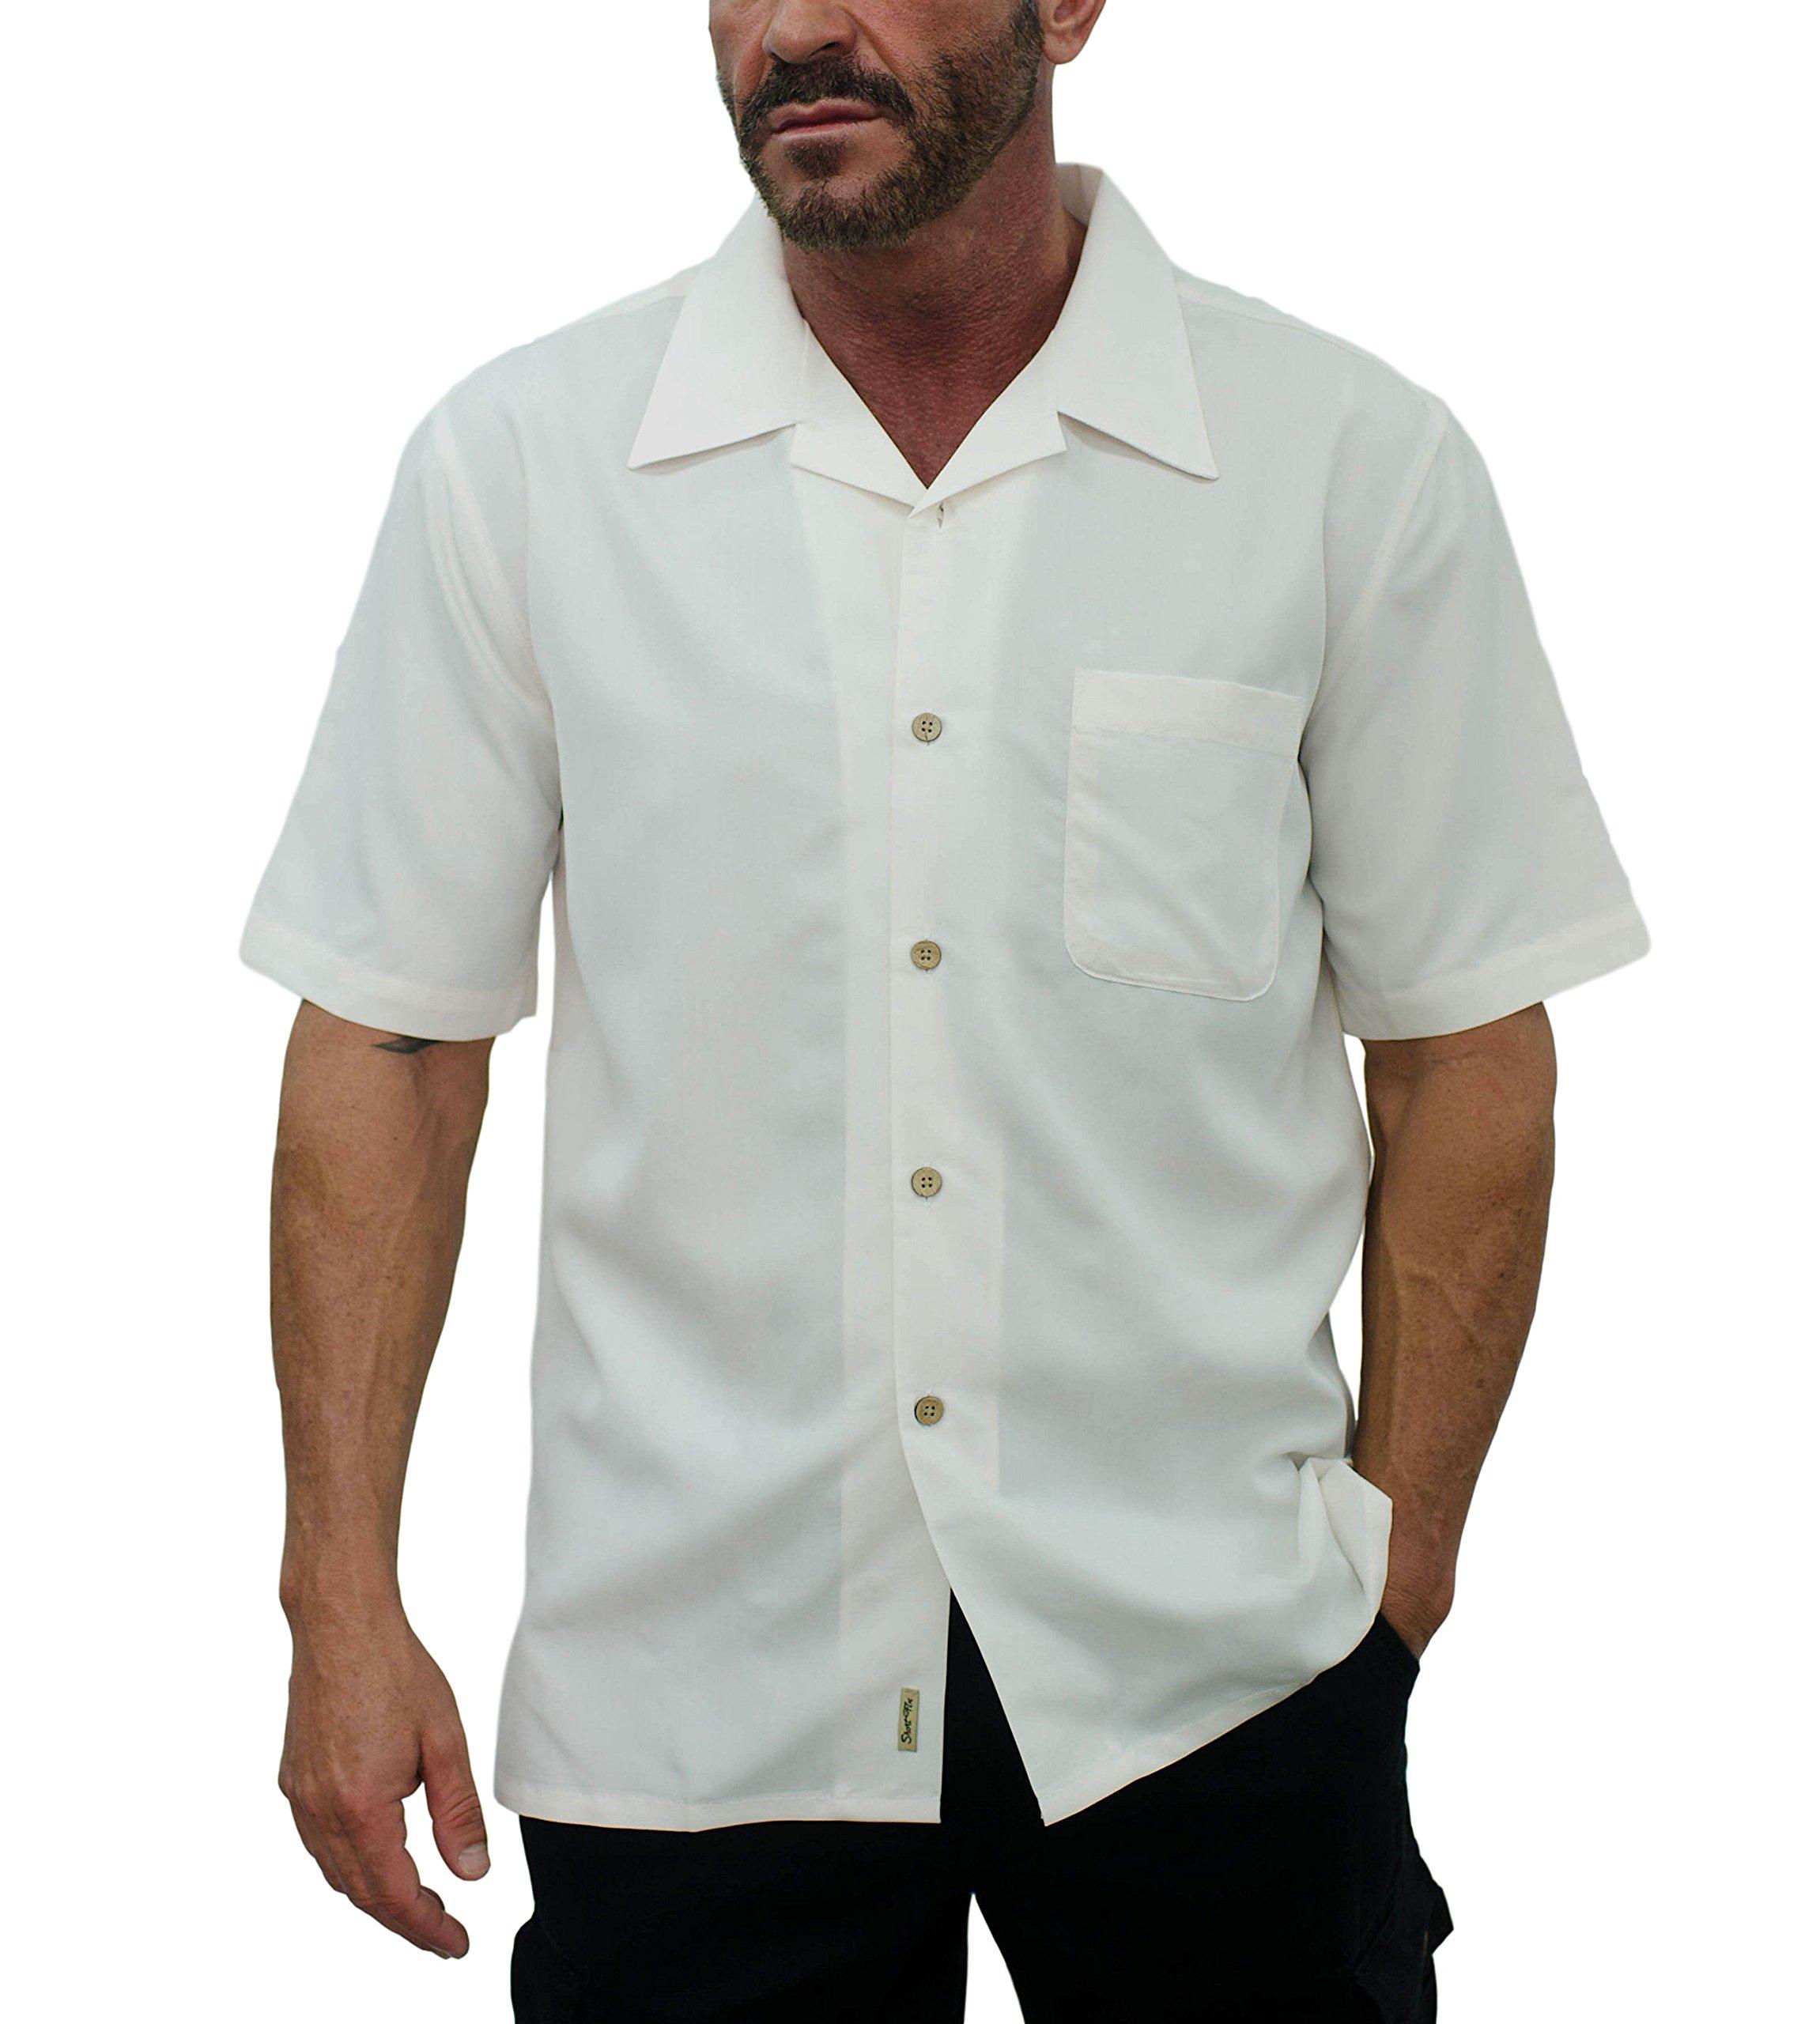 Short Fin short sleeve modal shirt (Natural, Size X Large, L8045)